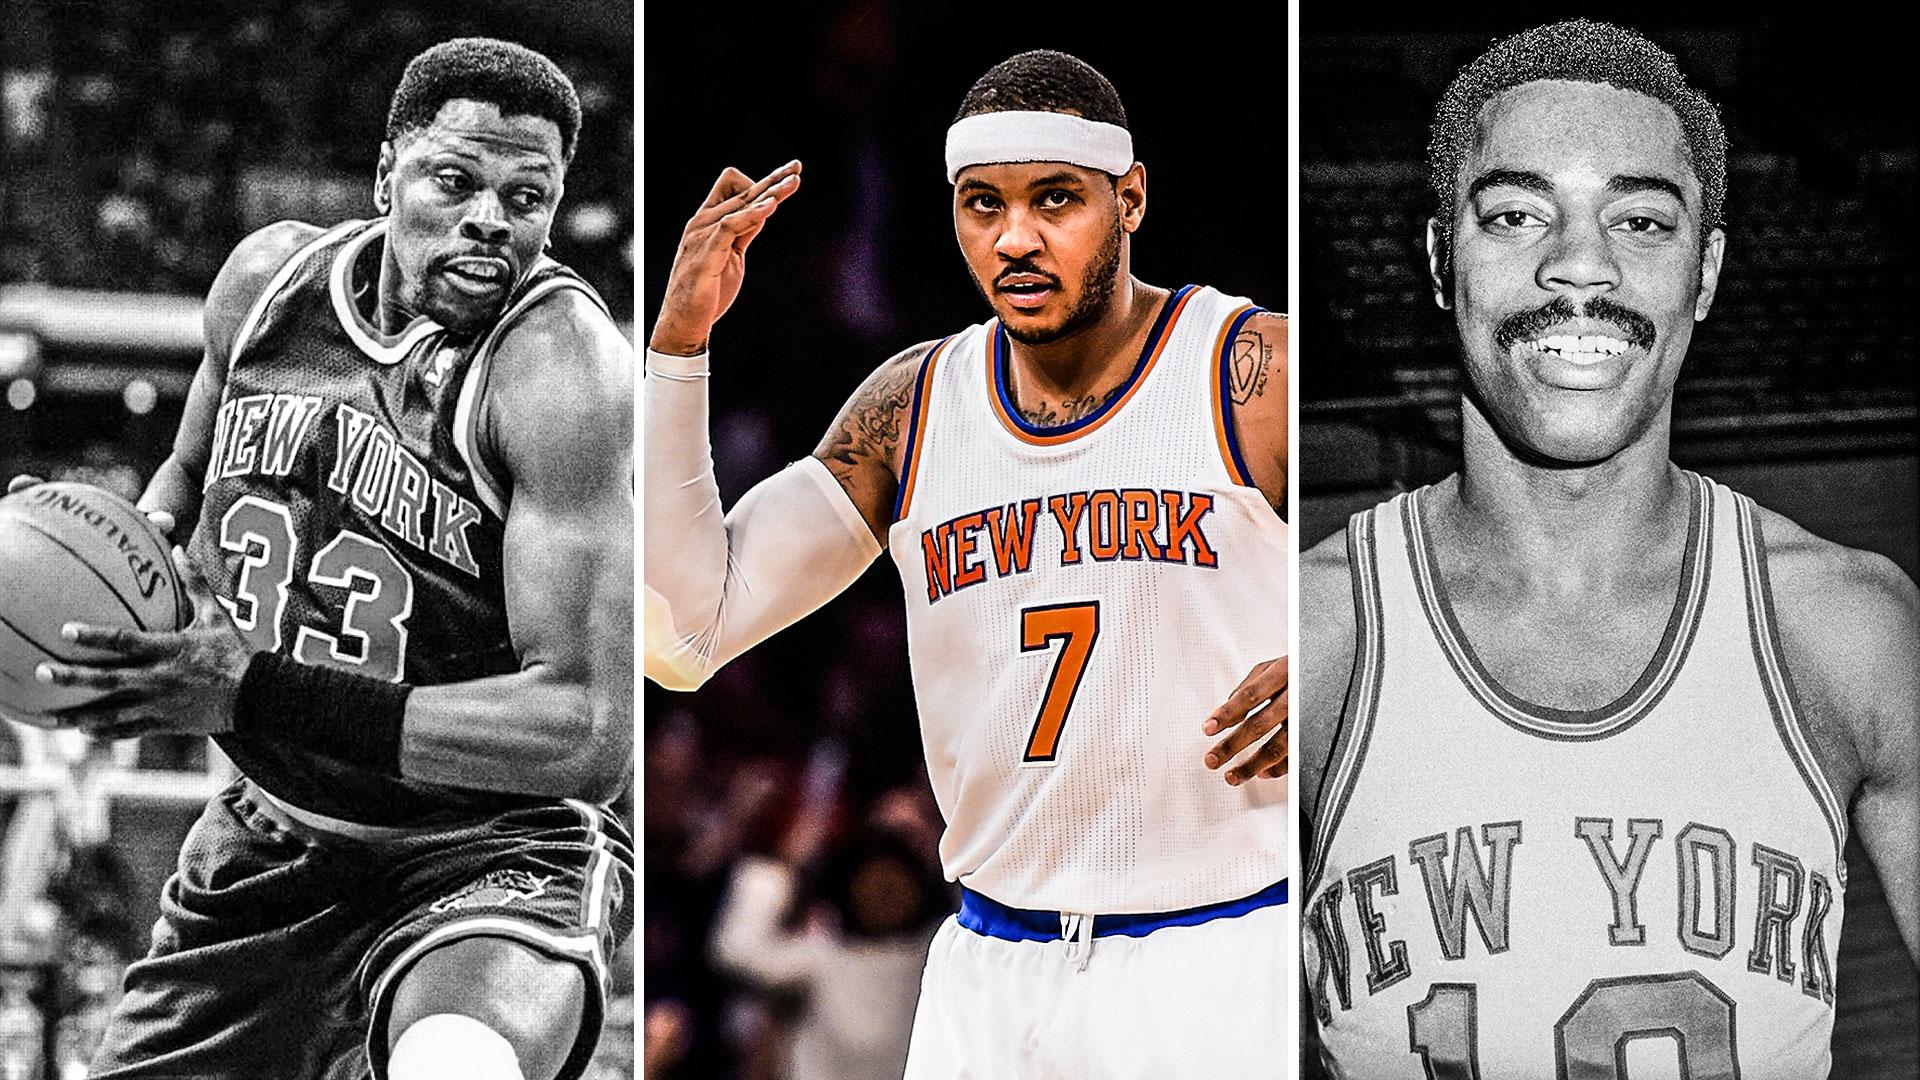 New York Knicks: All-time New York Knicks